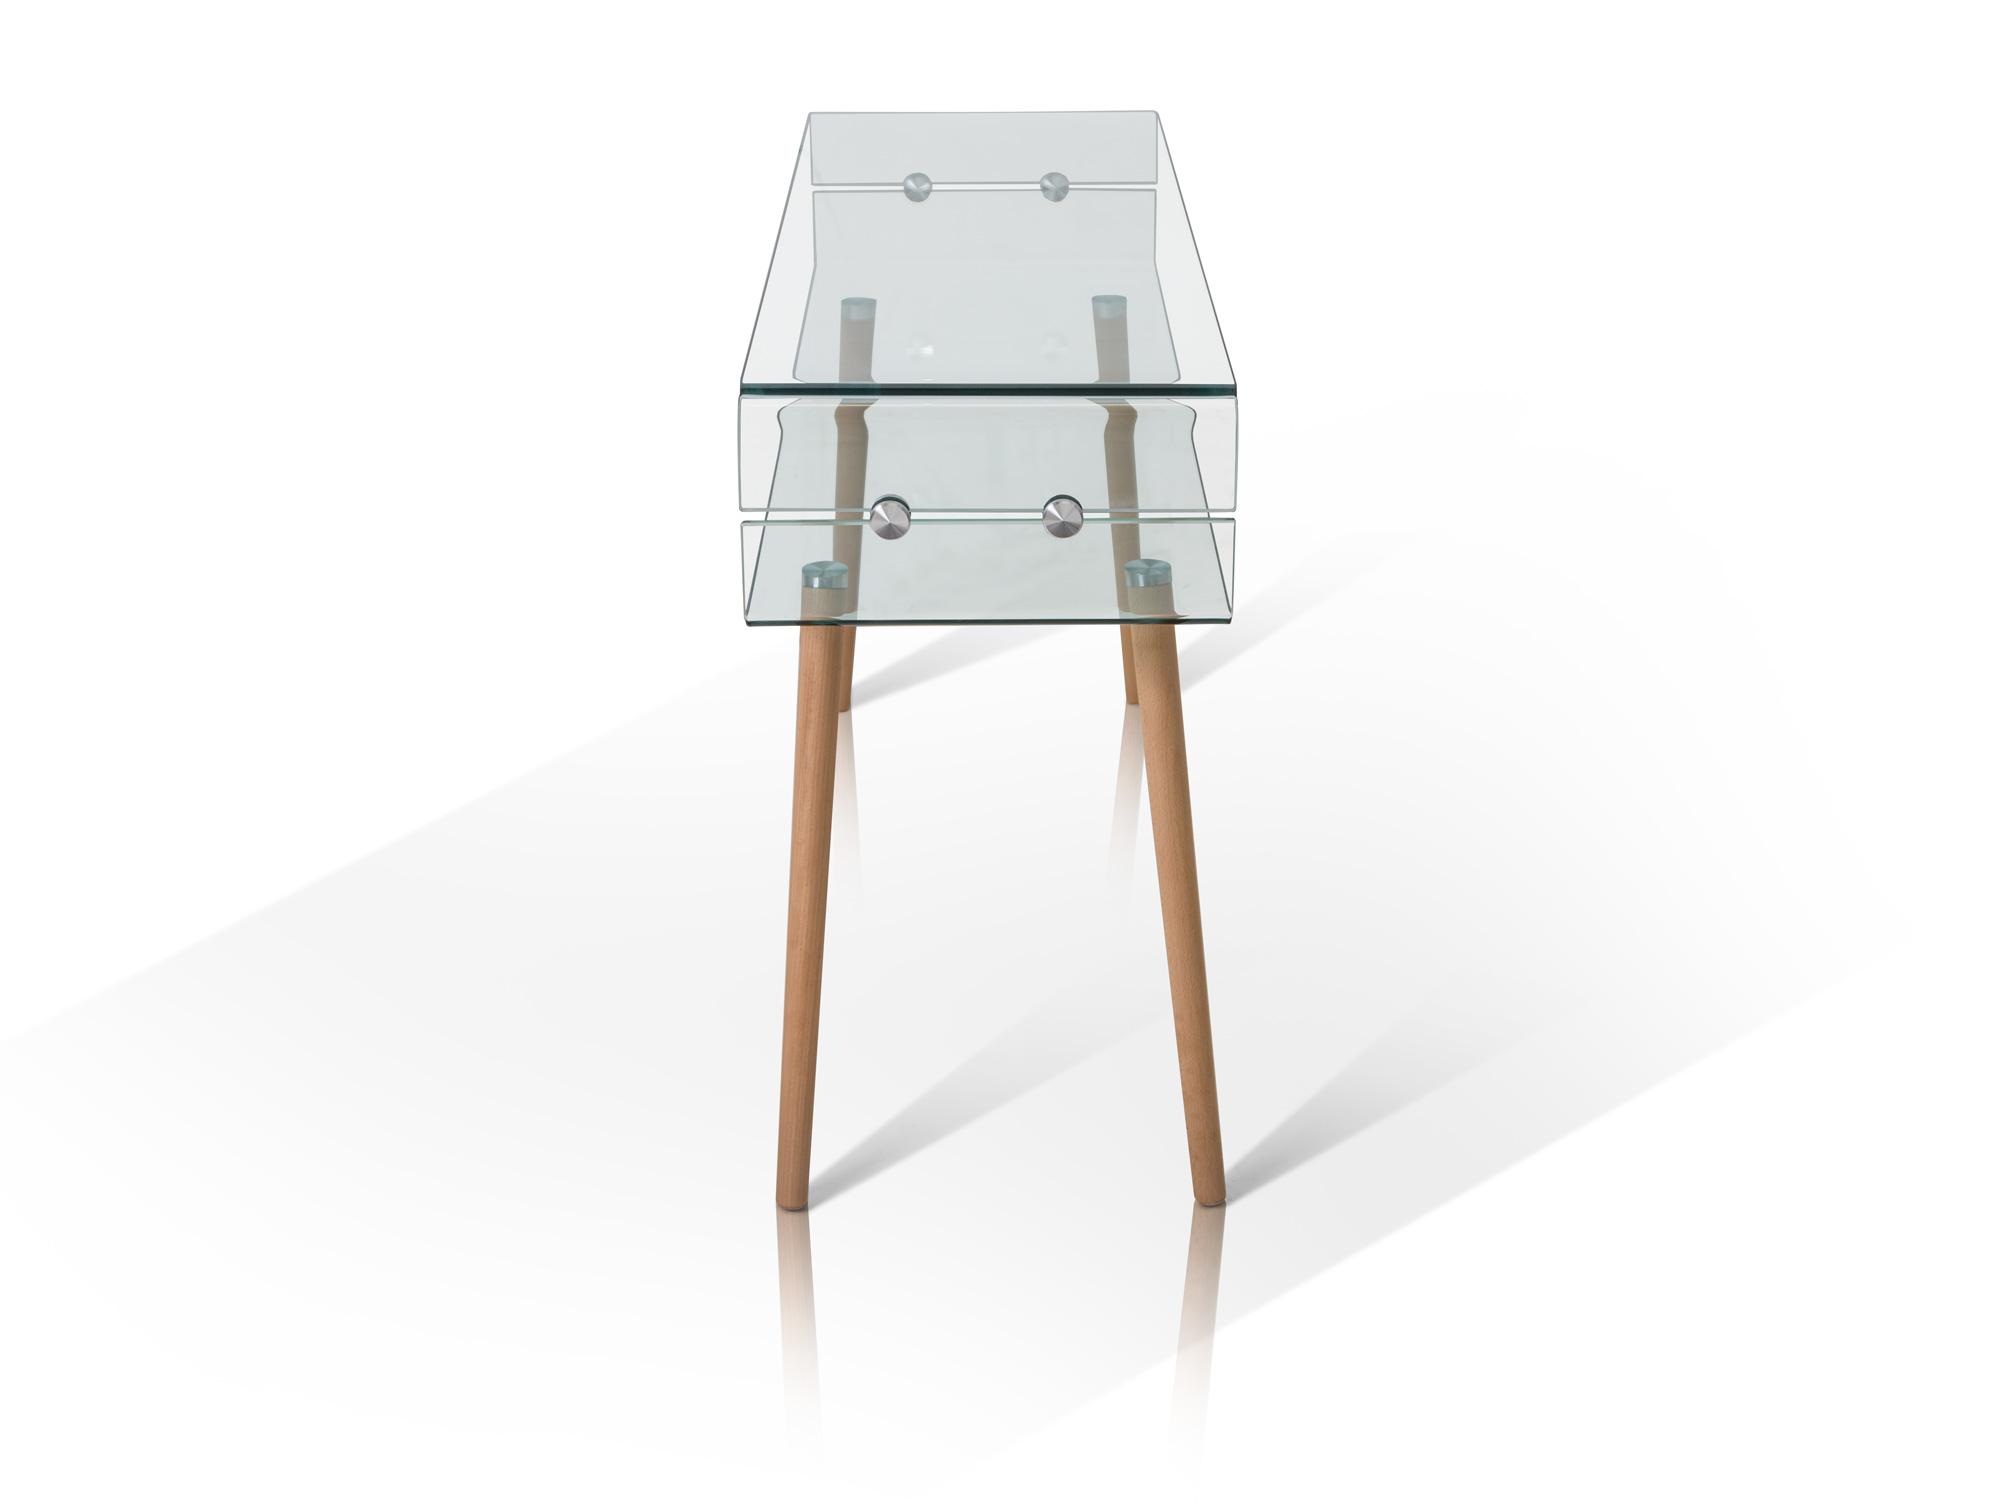 lisa beistelltisch glas f e buche. Black Bedroom Furniture Sets. Home Design Ideas